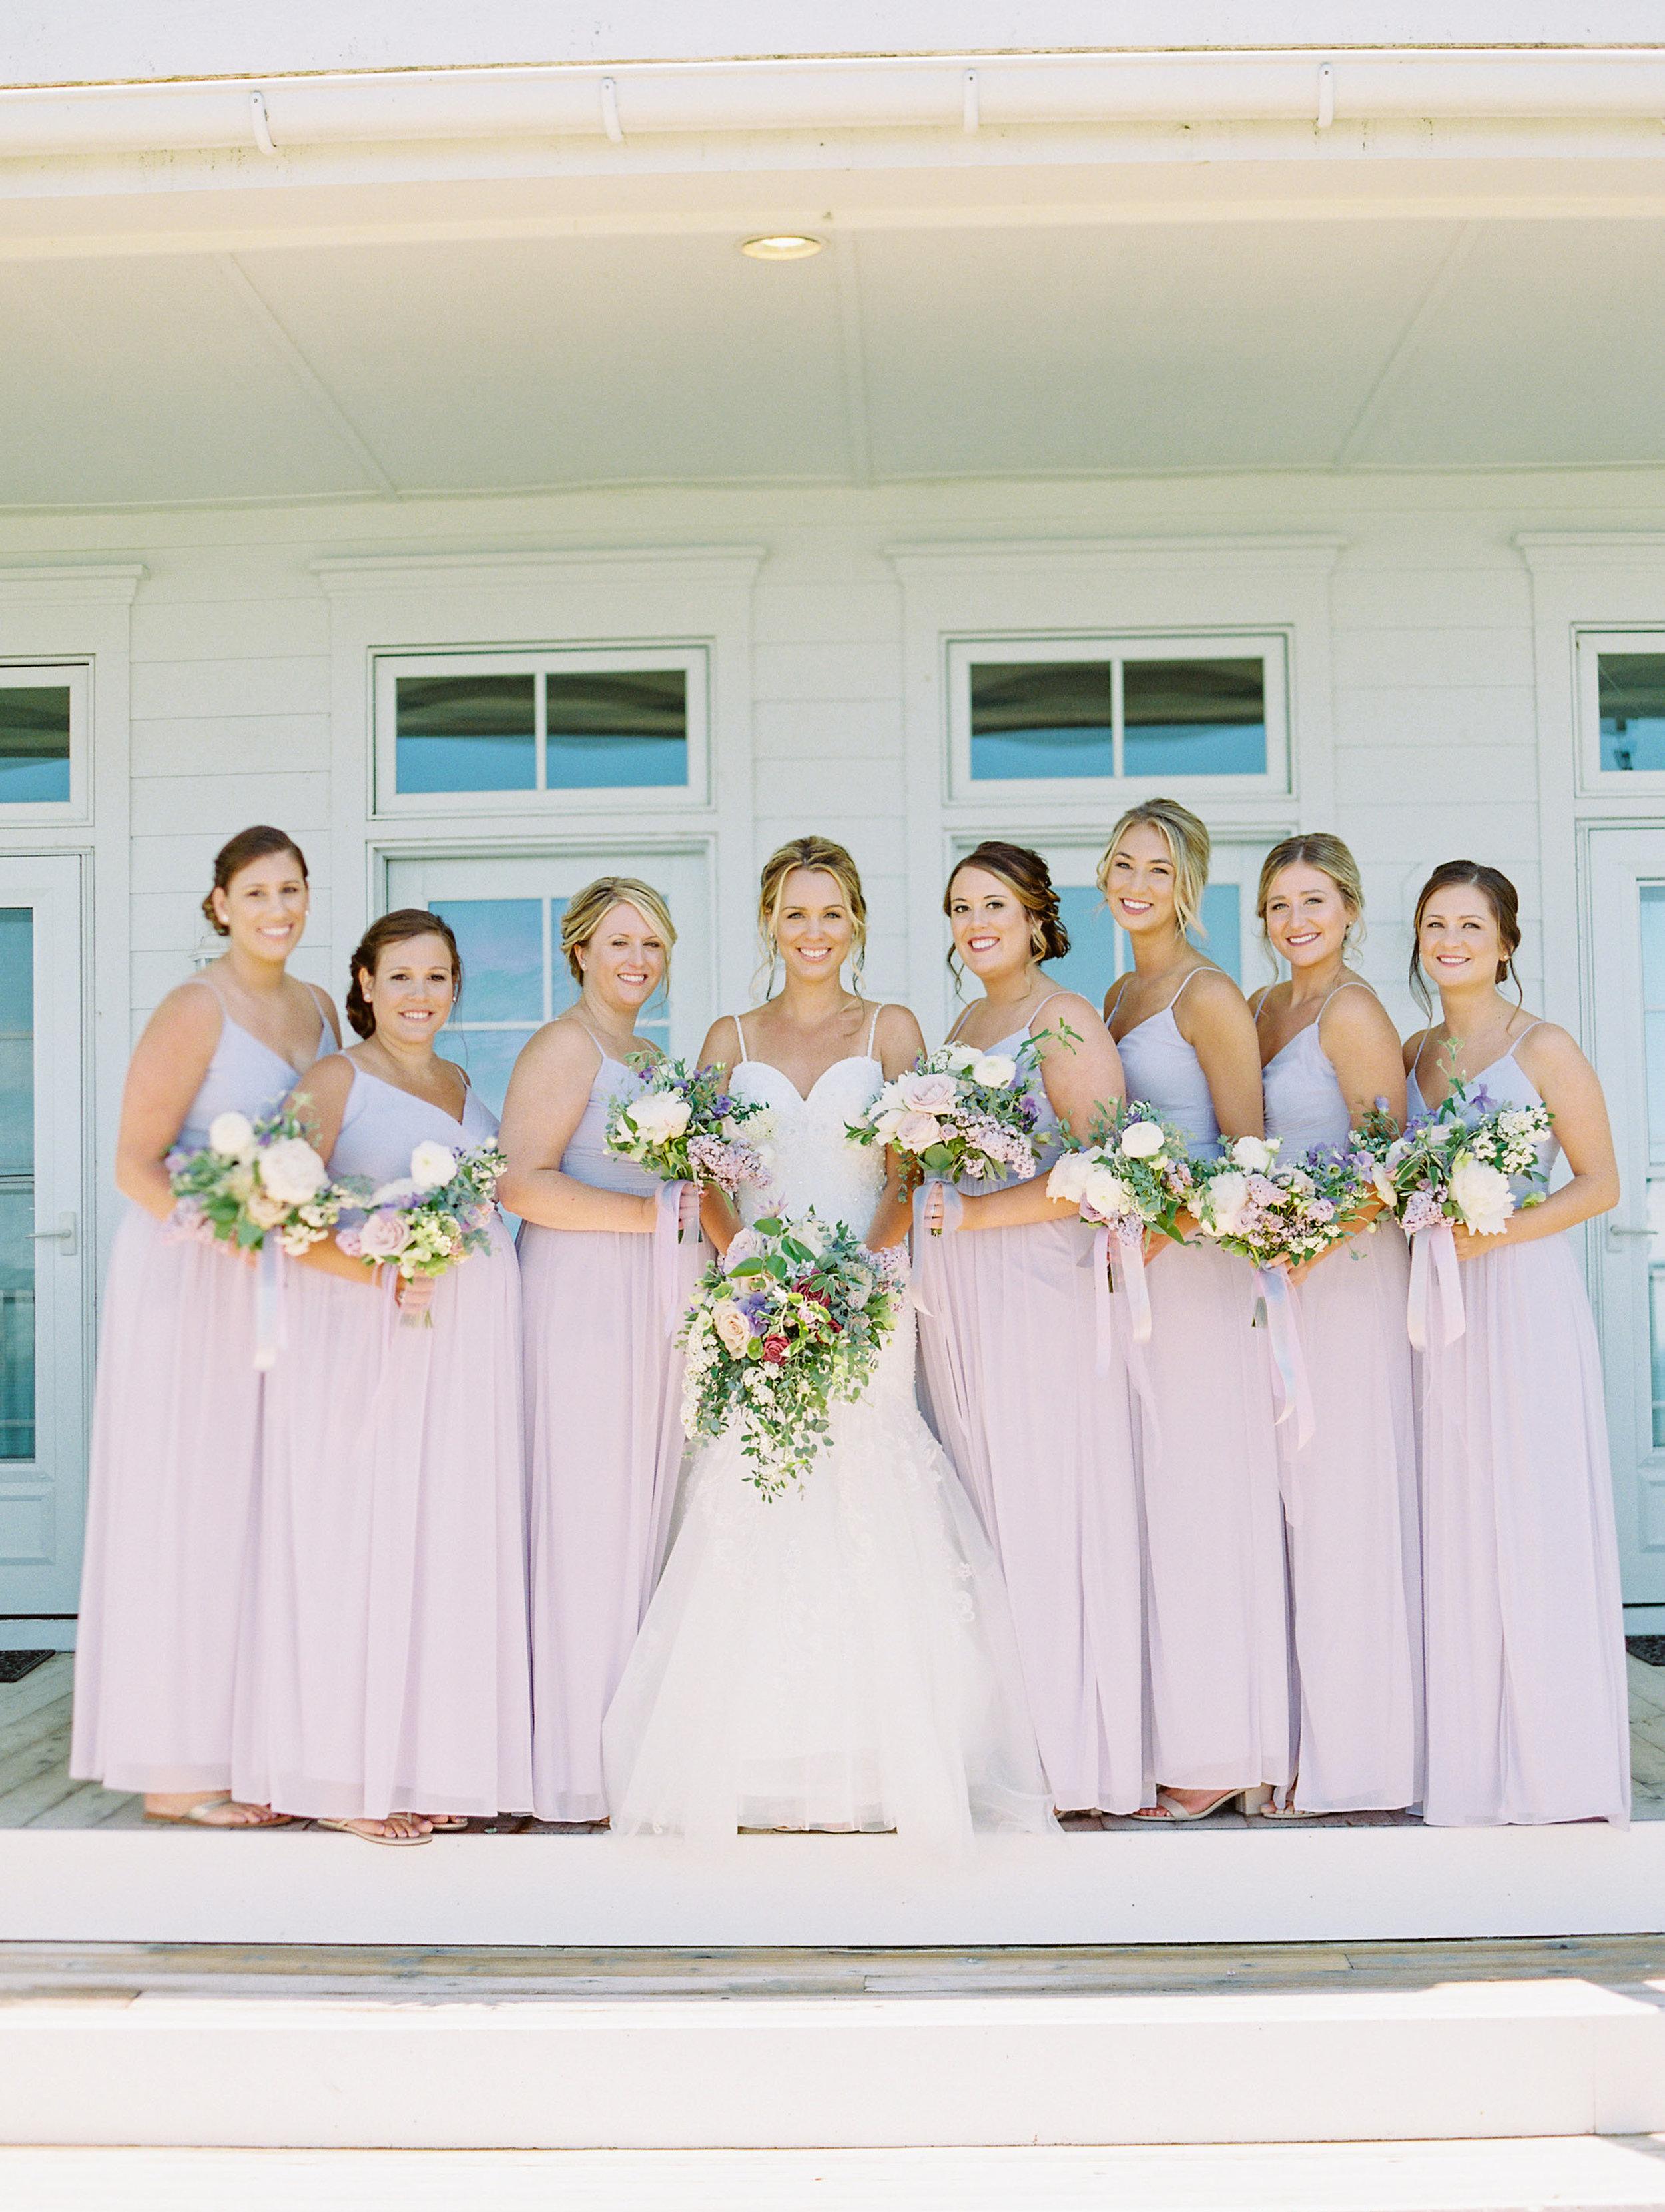 Noss+Wedding+Bride+Bridesmaids-4.jpg